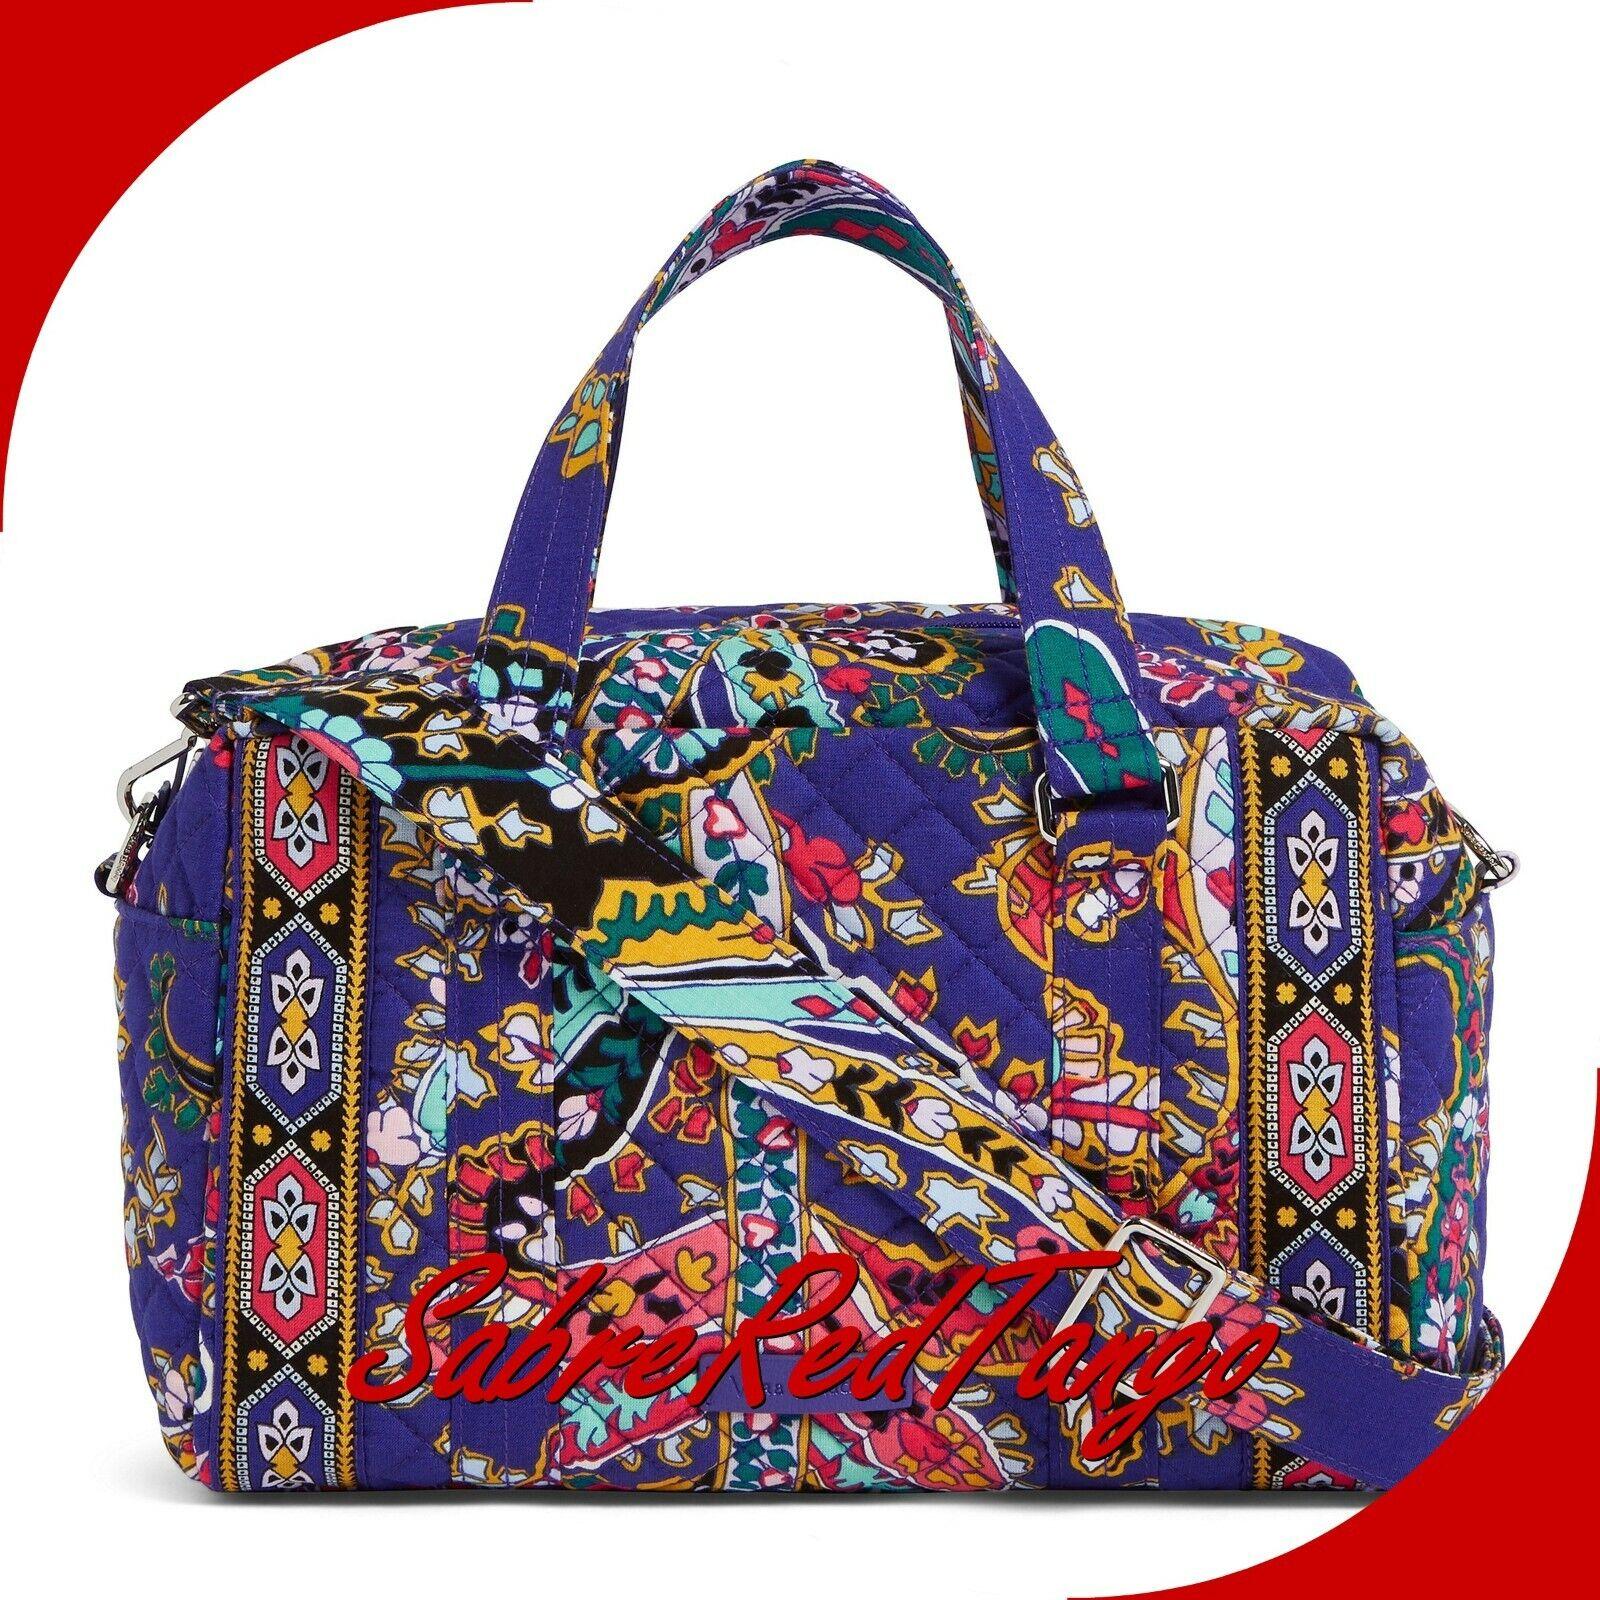 Vera Bradley Iconic 100 Handbag Satchel Romantic Paisley 239